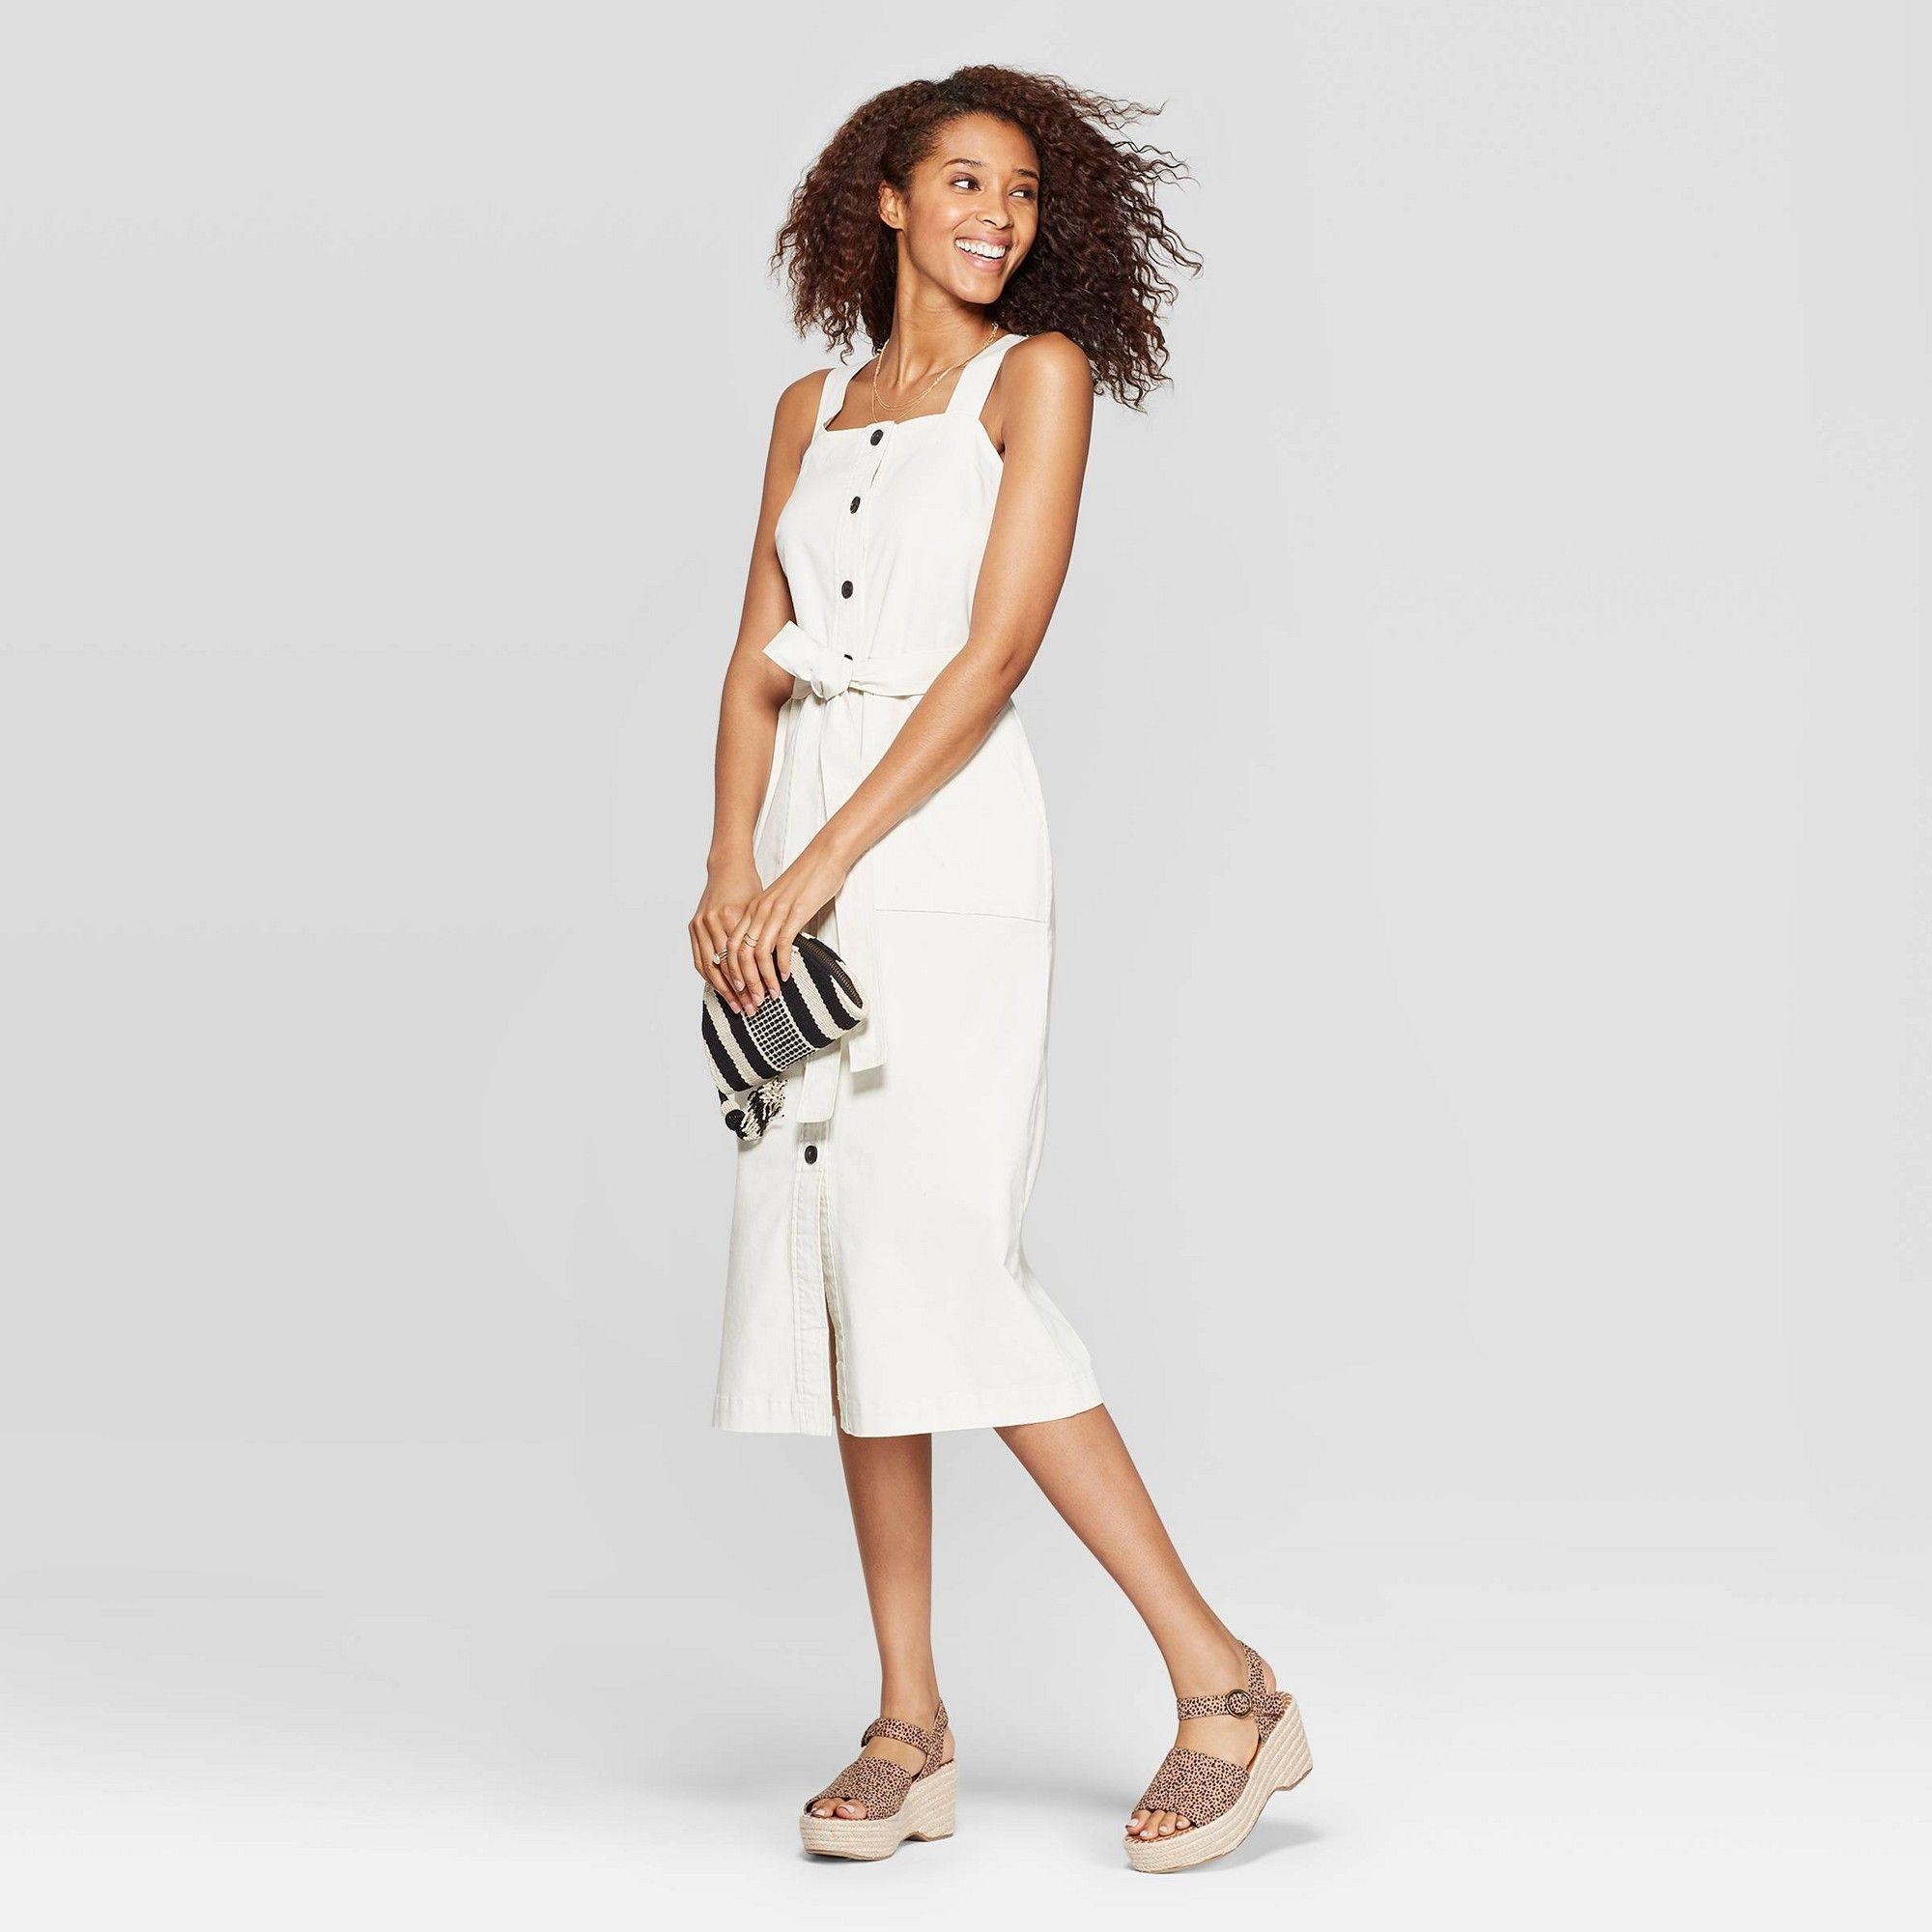 Women S Sleeveless Square Neck Midi Button Front Belted Dress Universal Thread White S Snowball White Belted Midi Dress Belted Dress Midi Dress Sleeveless [ 2000 x 2000 Pixel ]